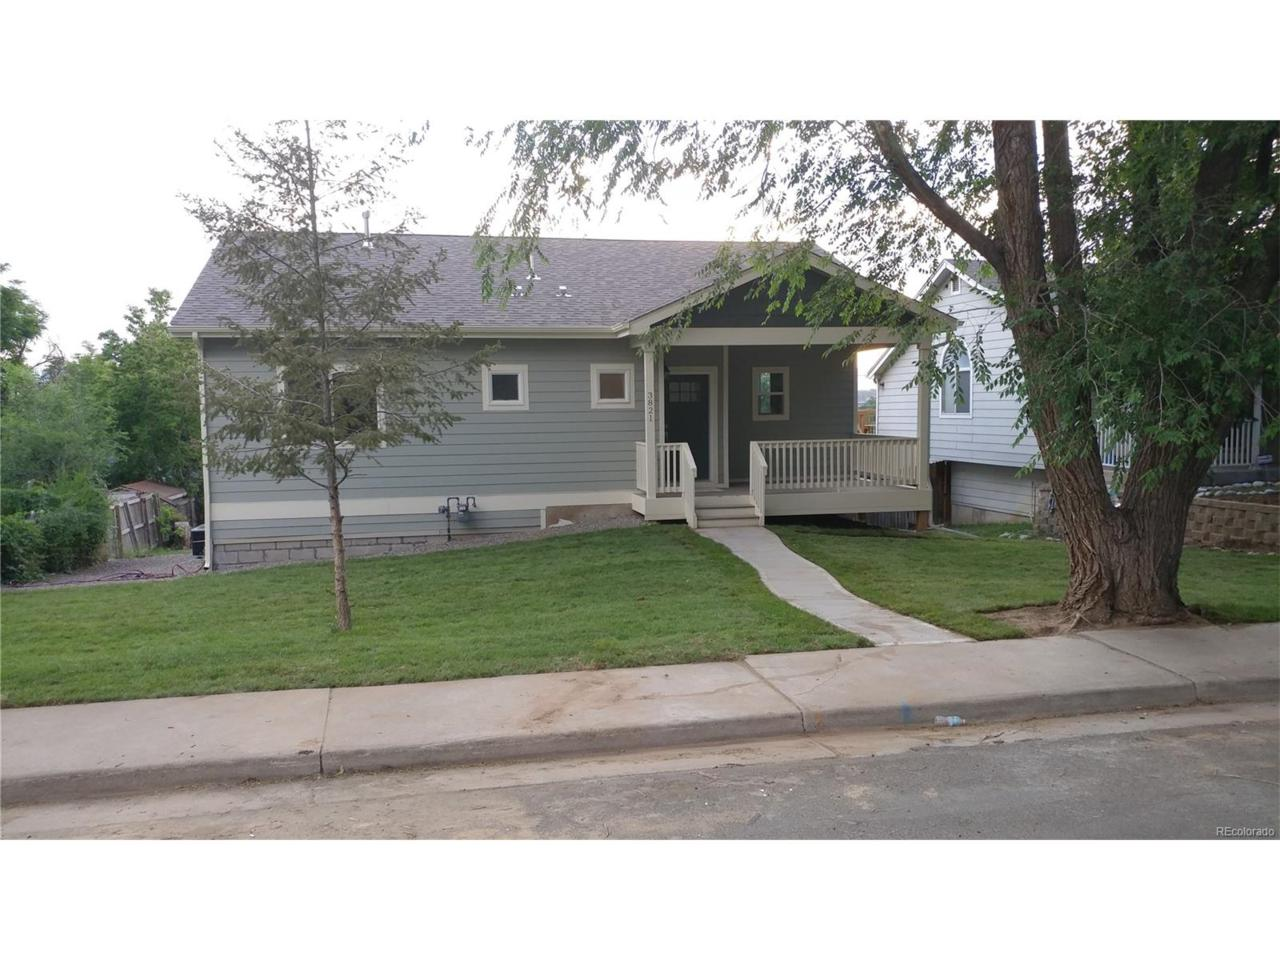 3821 S Delaware Street, Englewood, CO 80110 (MLS #8343541) :: 8z Real Estate